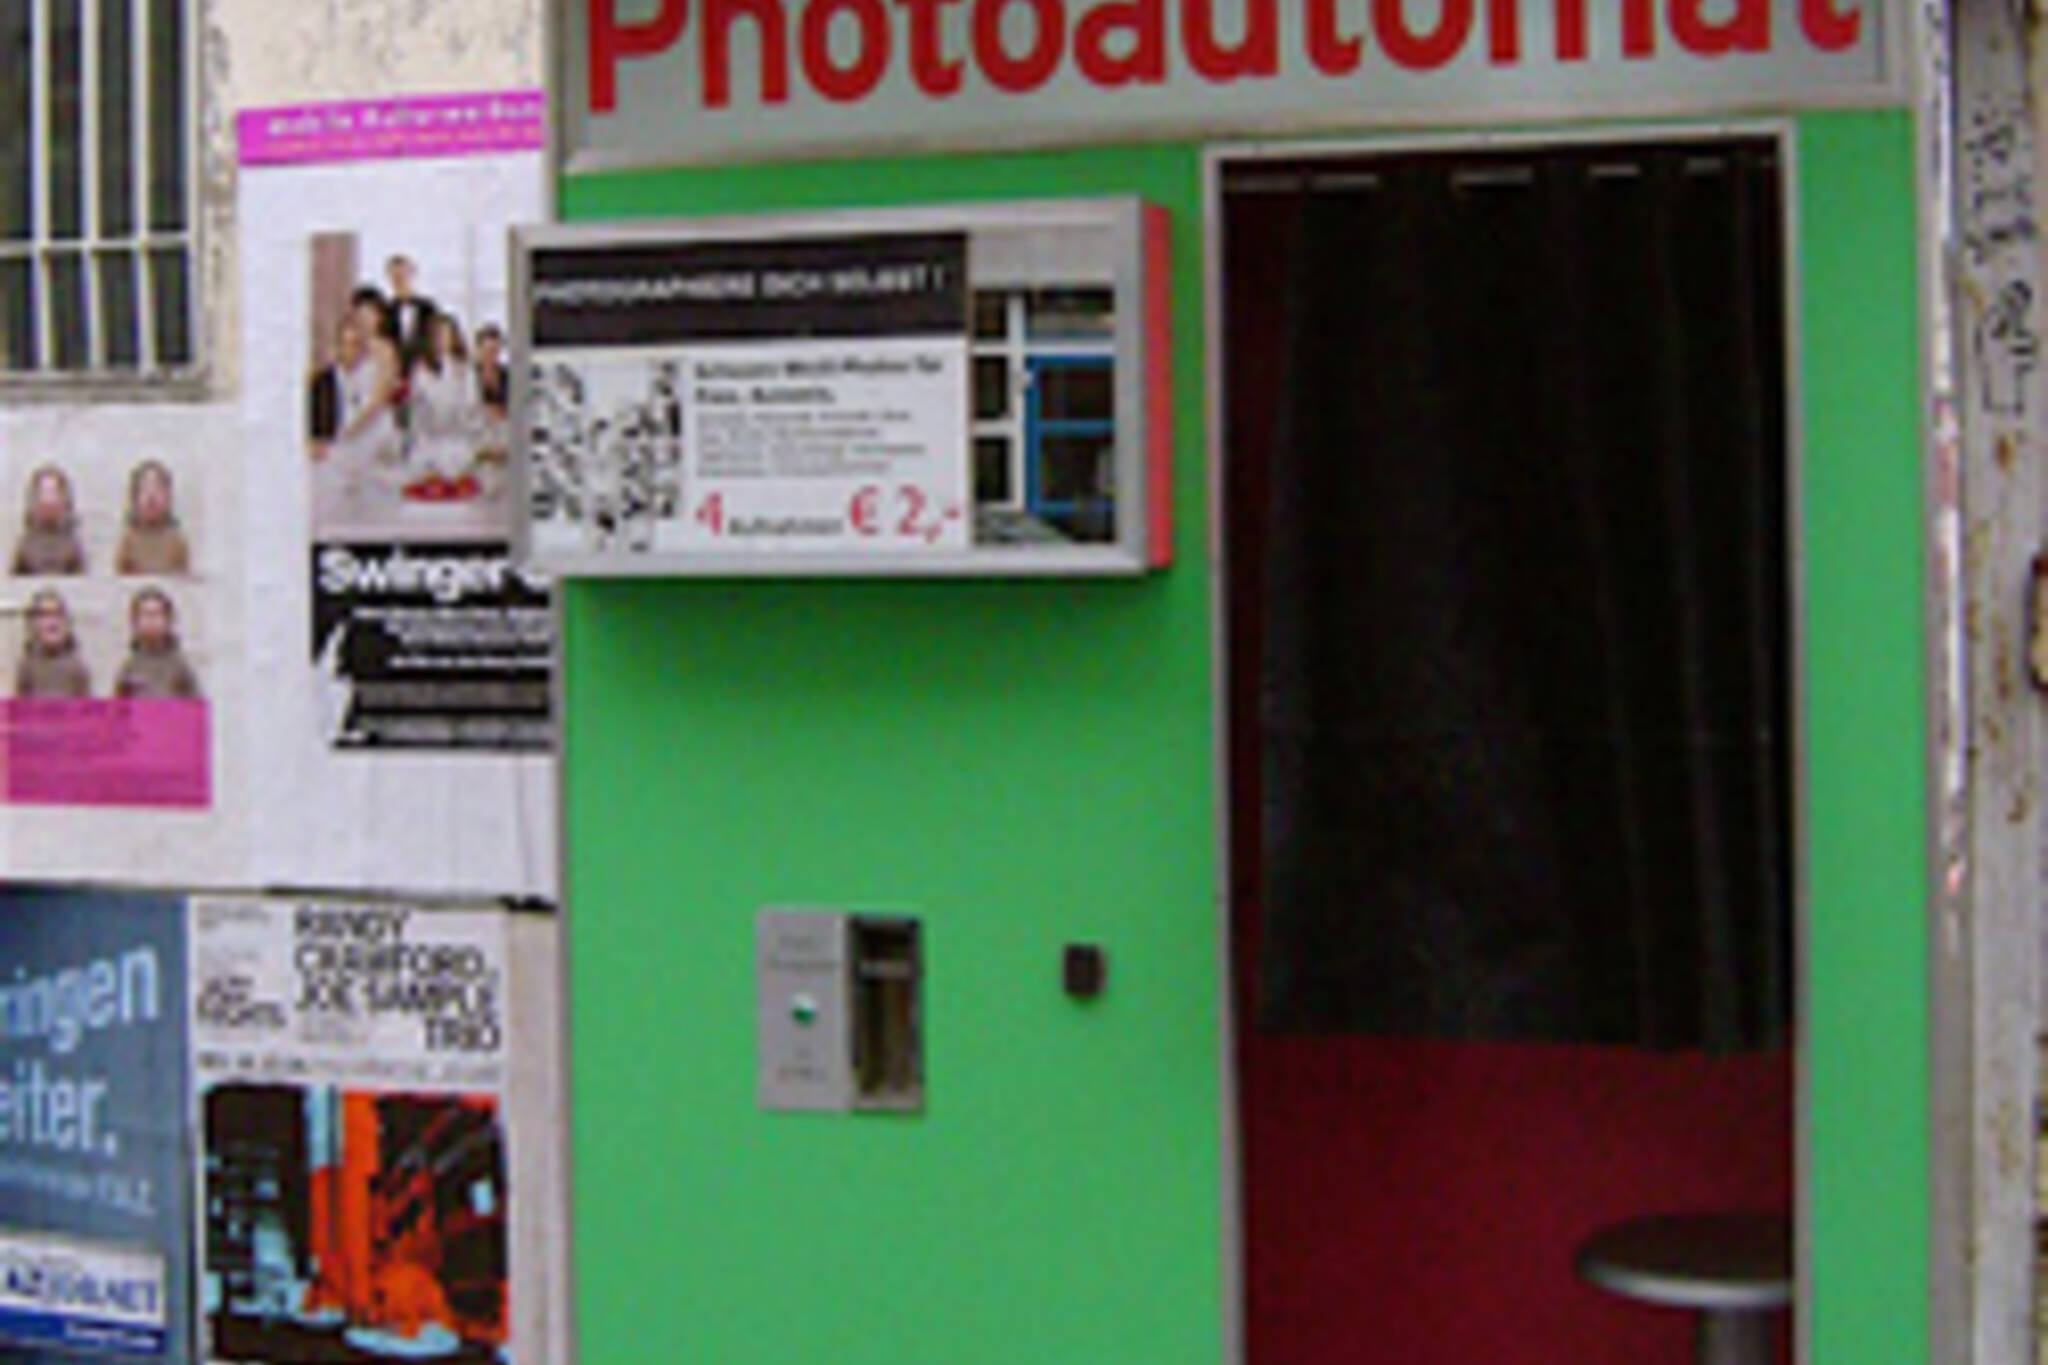 galleryDK PhotoLab show opening